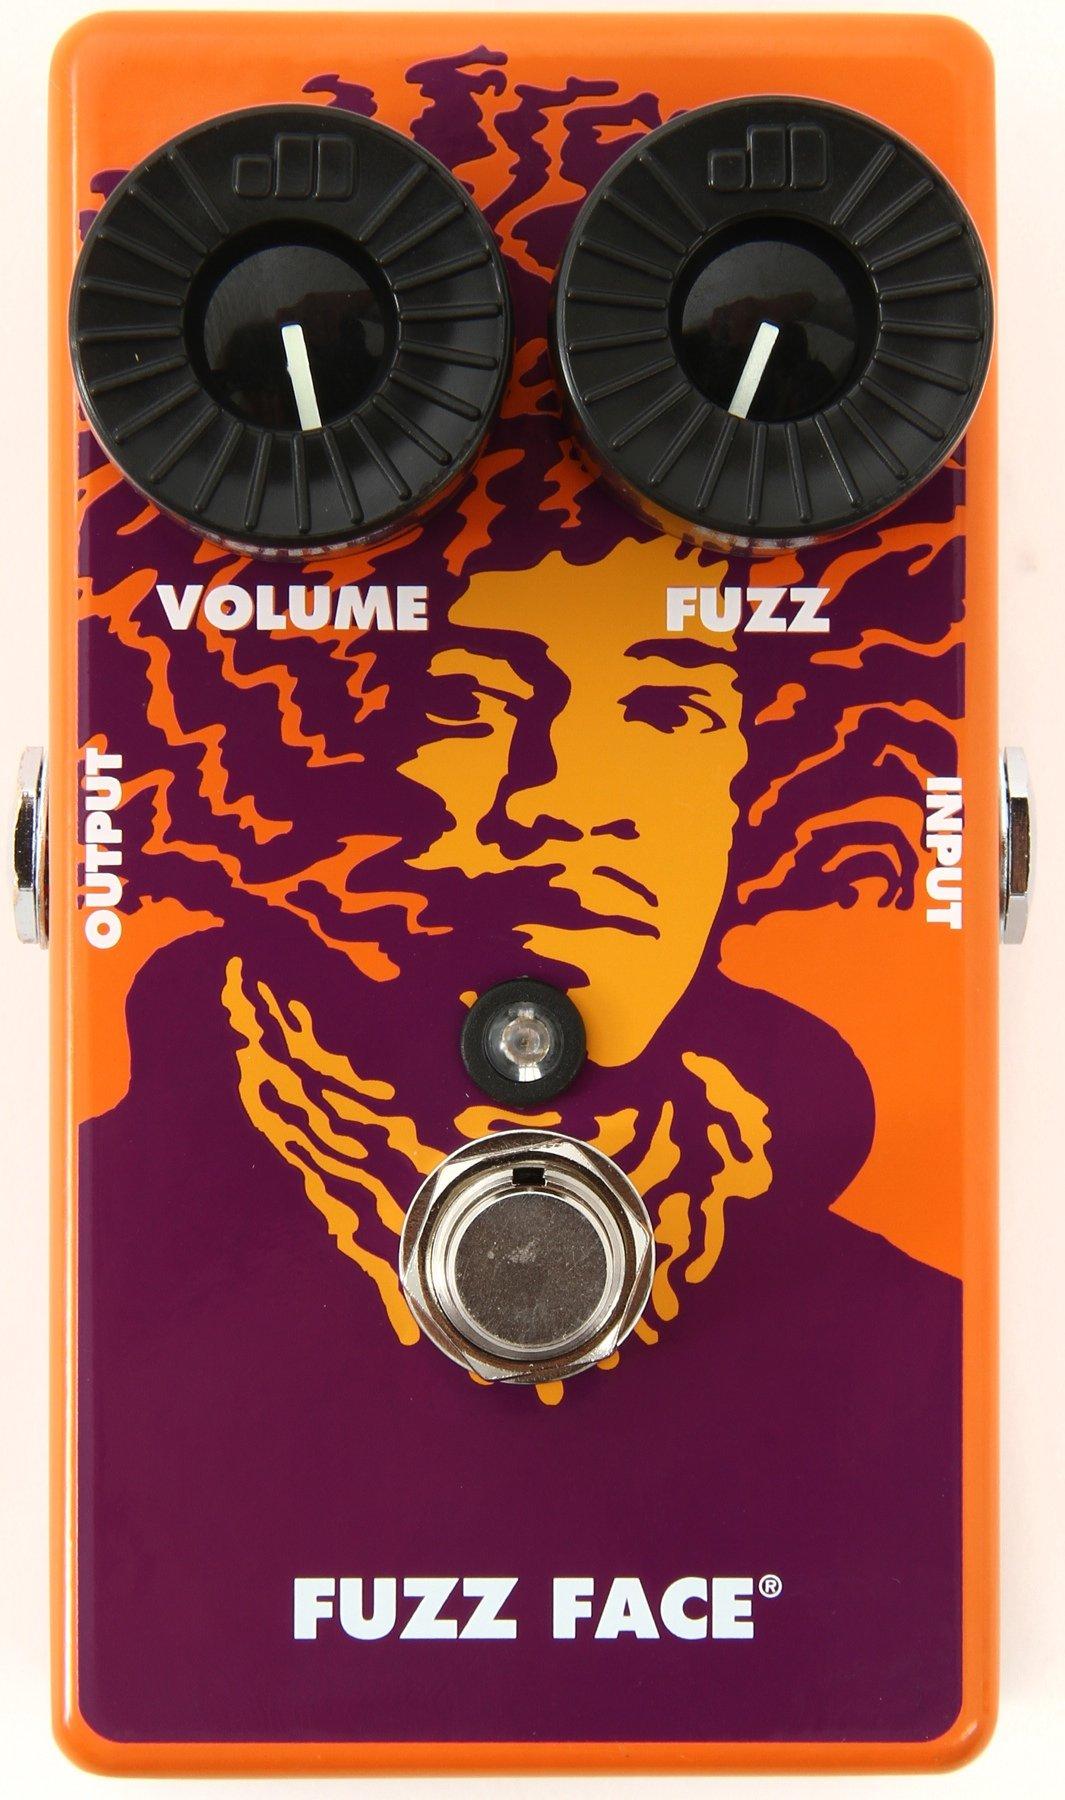 Mxr Jimi Hendrix 70th Anniversary Tribute Series Fuzz Face Sweetwater Pedal Image 1